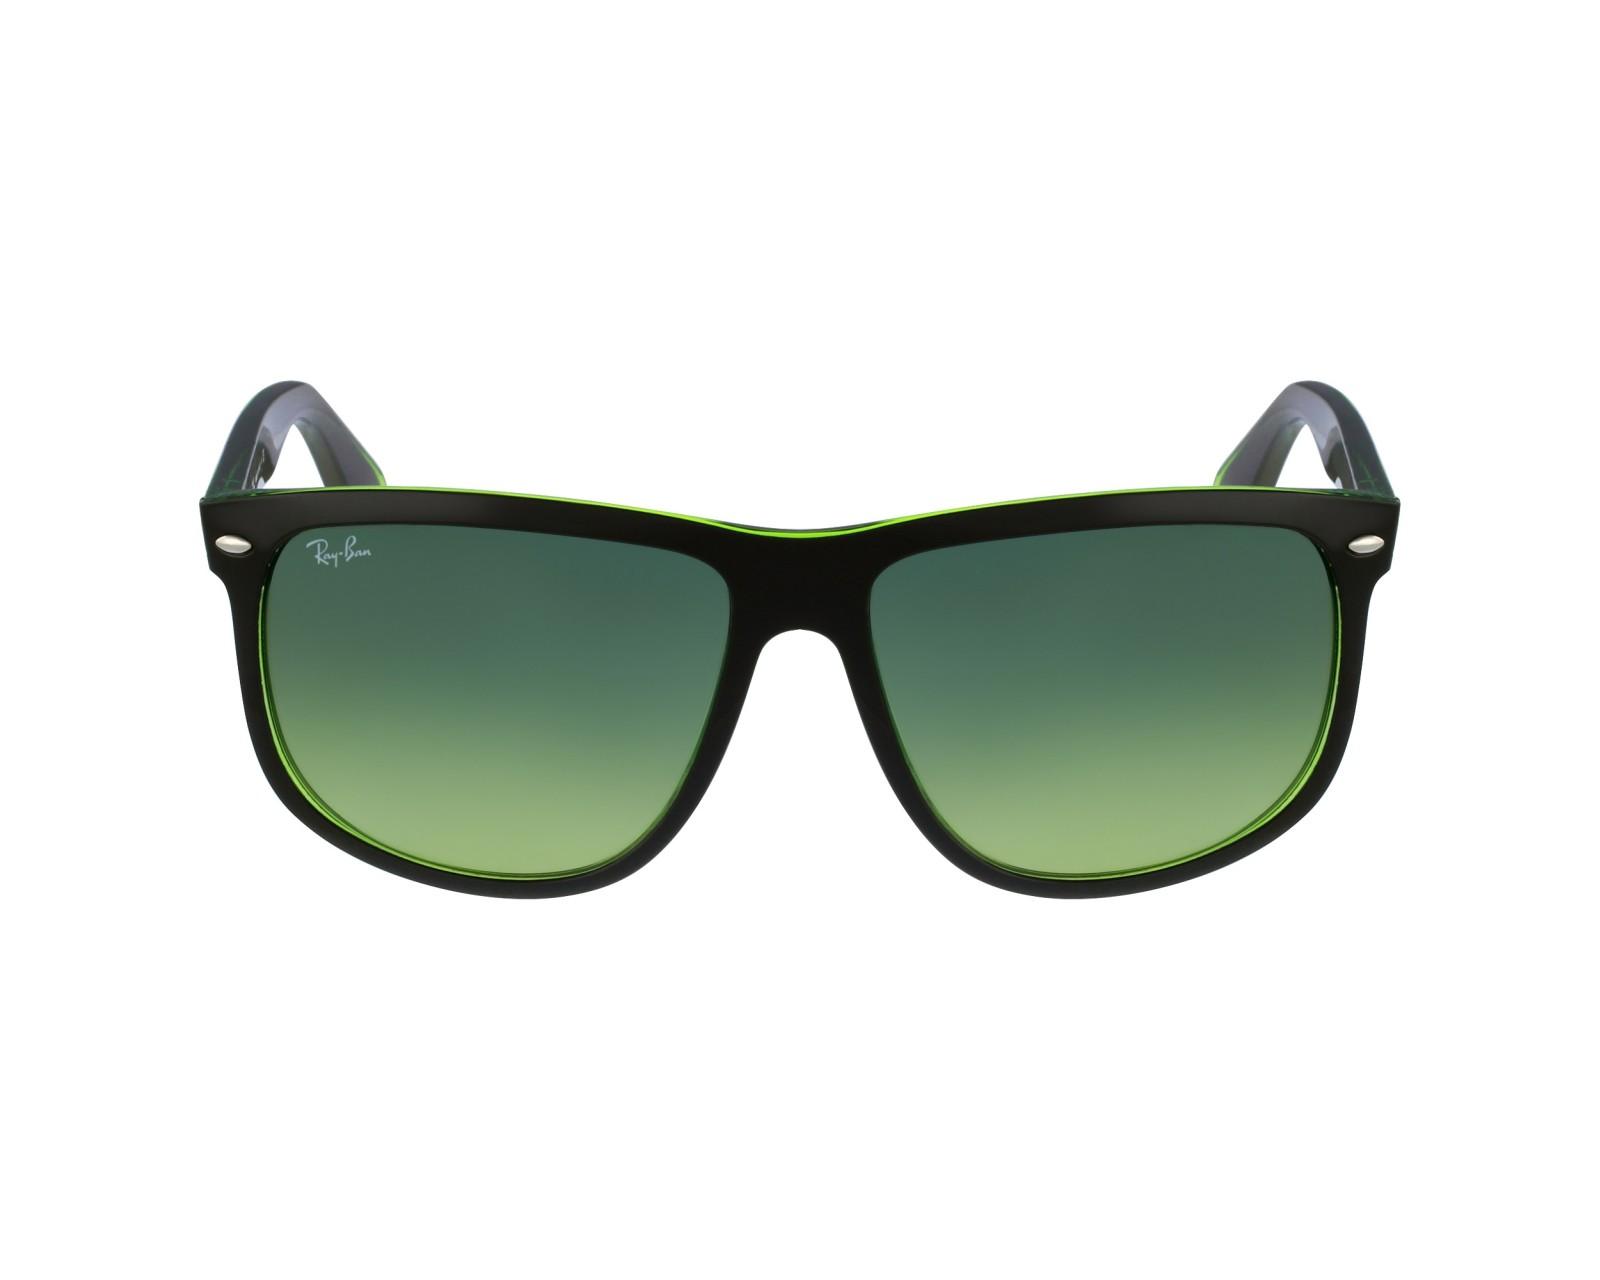 3cce4871ff thumbnail Sunglasses Ray-Ban RB-4147 6094 3M - Black Green profile view